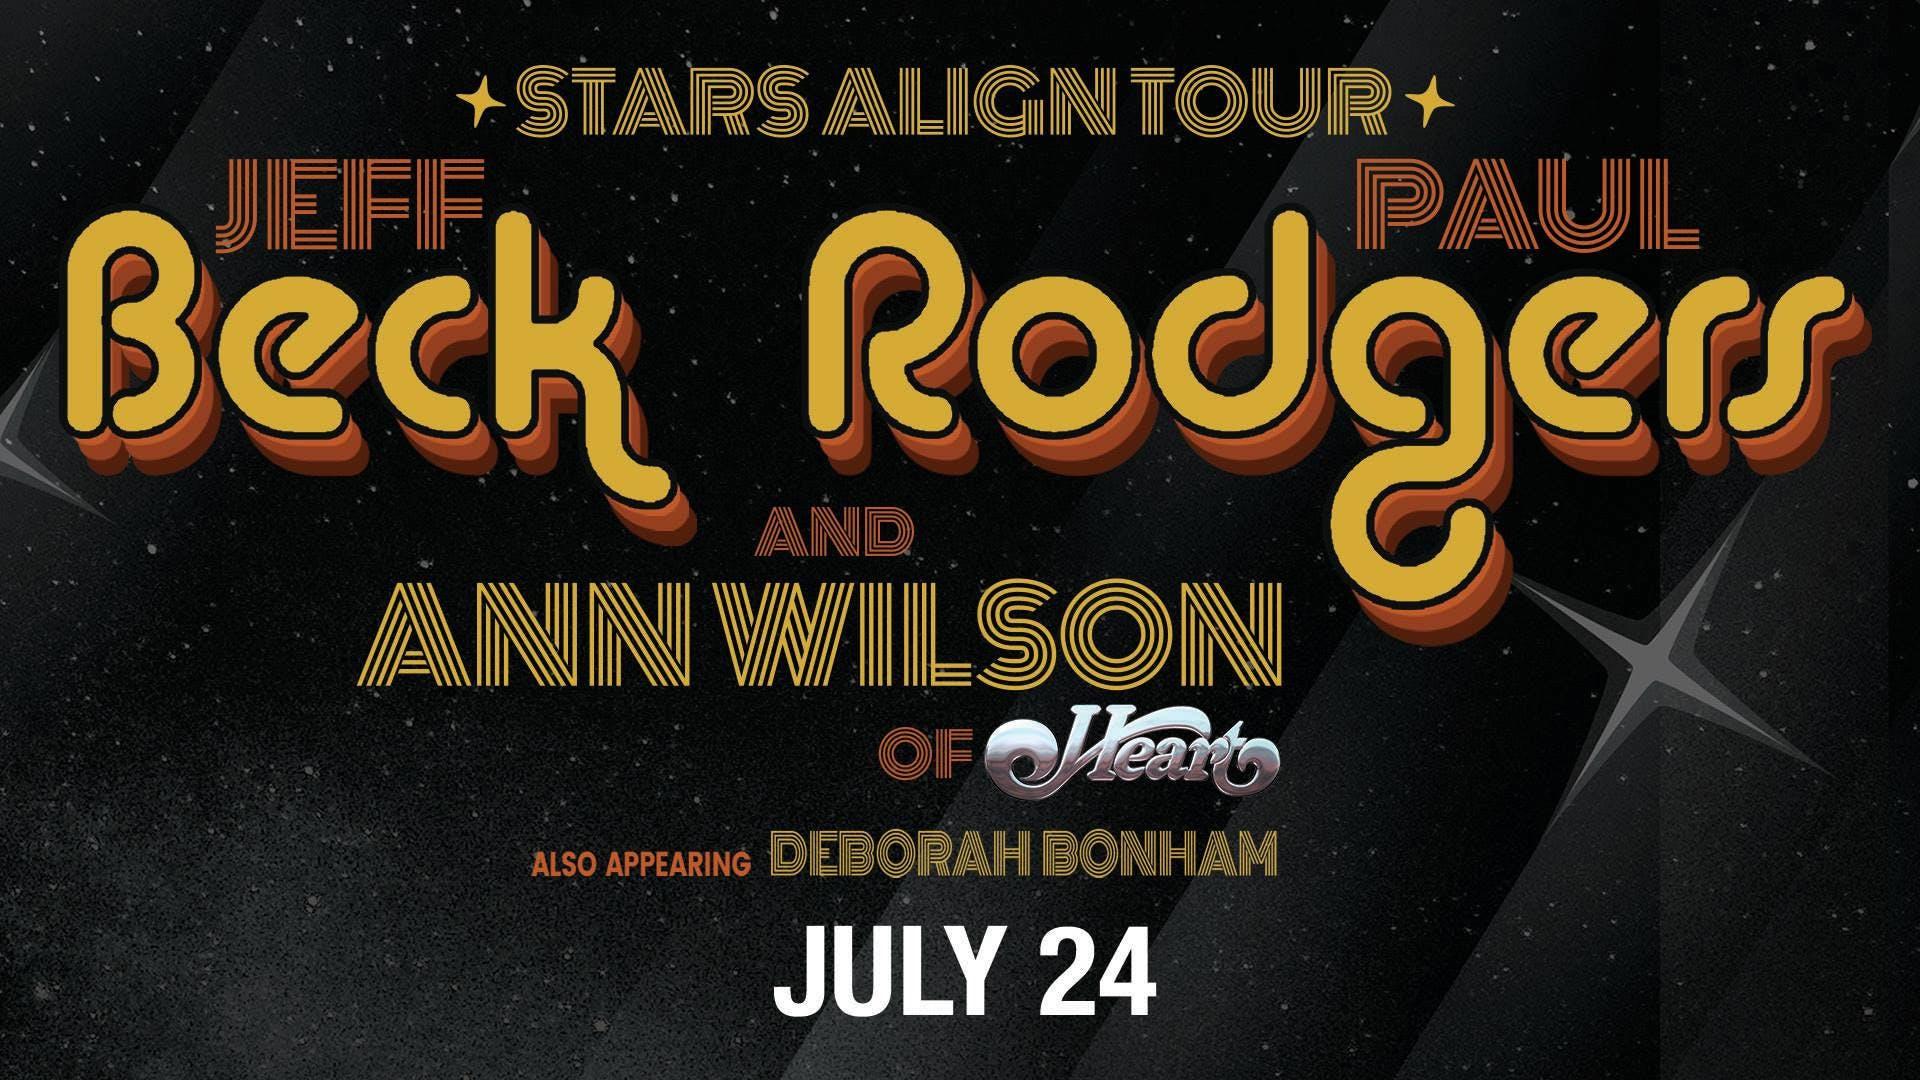 Stars-Align-Tour-Jeff-Beck-Paul-Rodgers-Ann-Wilson-of-Heart